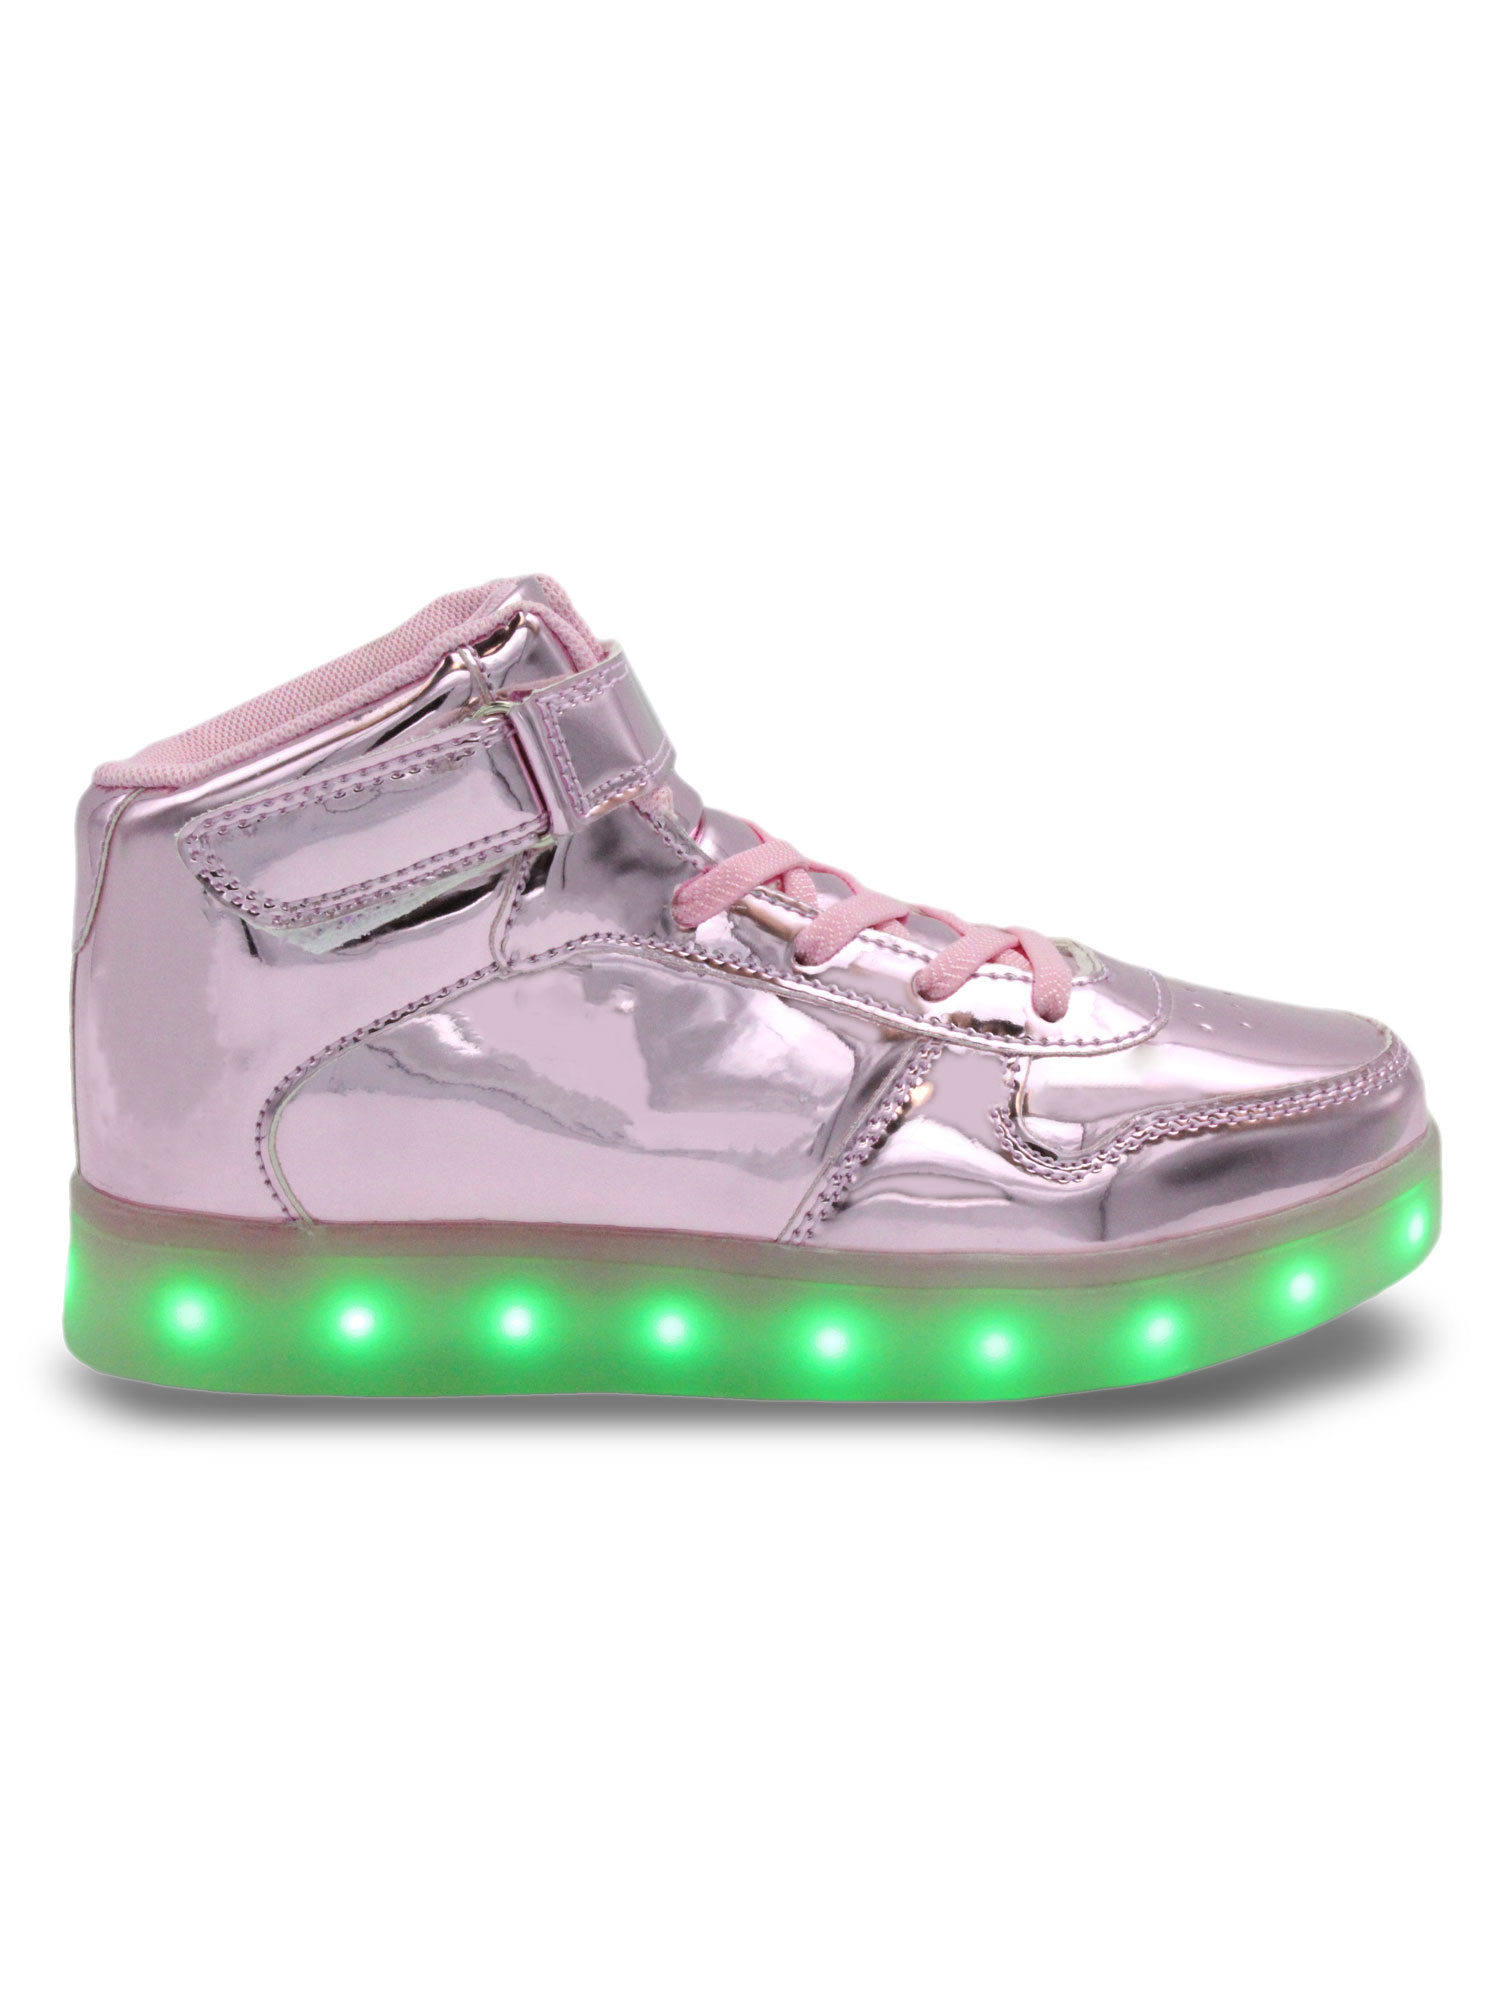 Galaxy LED Shoes Light Up USB Charging